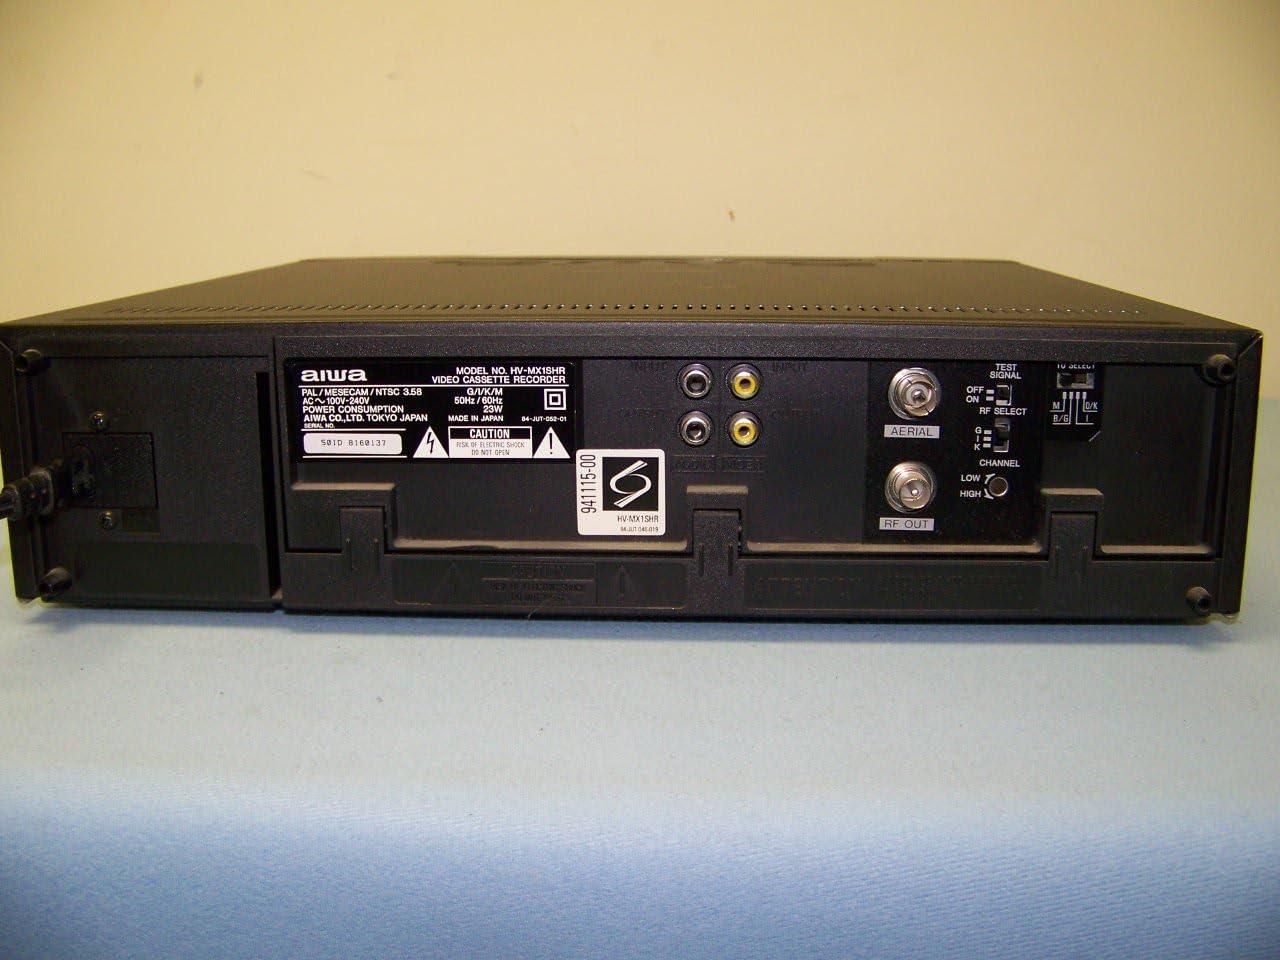 alpha-ene.co.jp Aiwa HV-MX1 Worldwide Video NTSC/PAL VCR VCRs ...